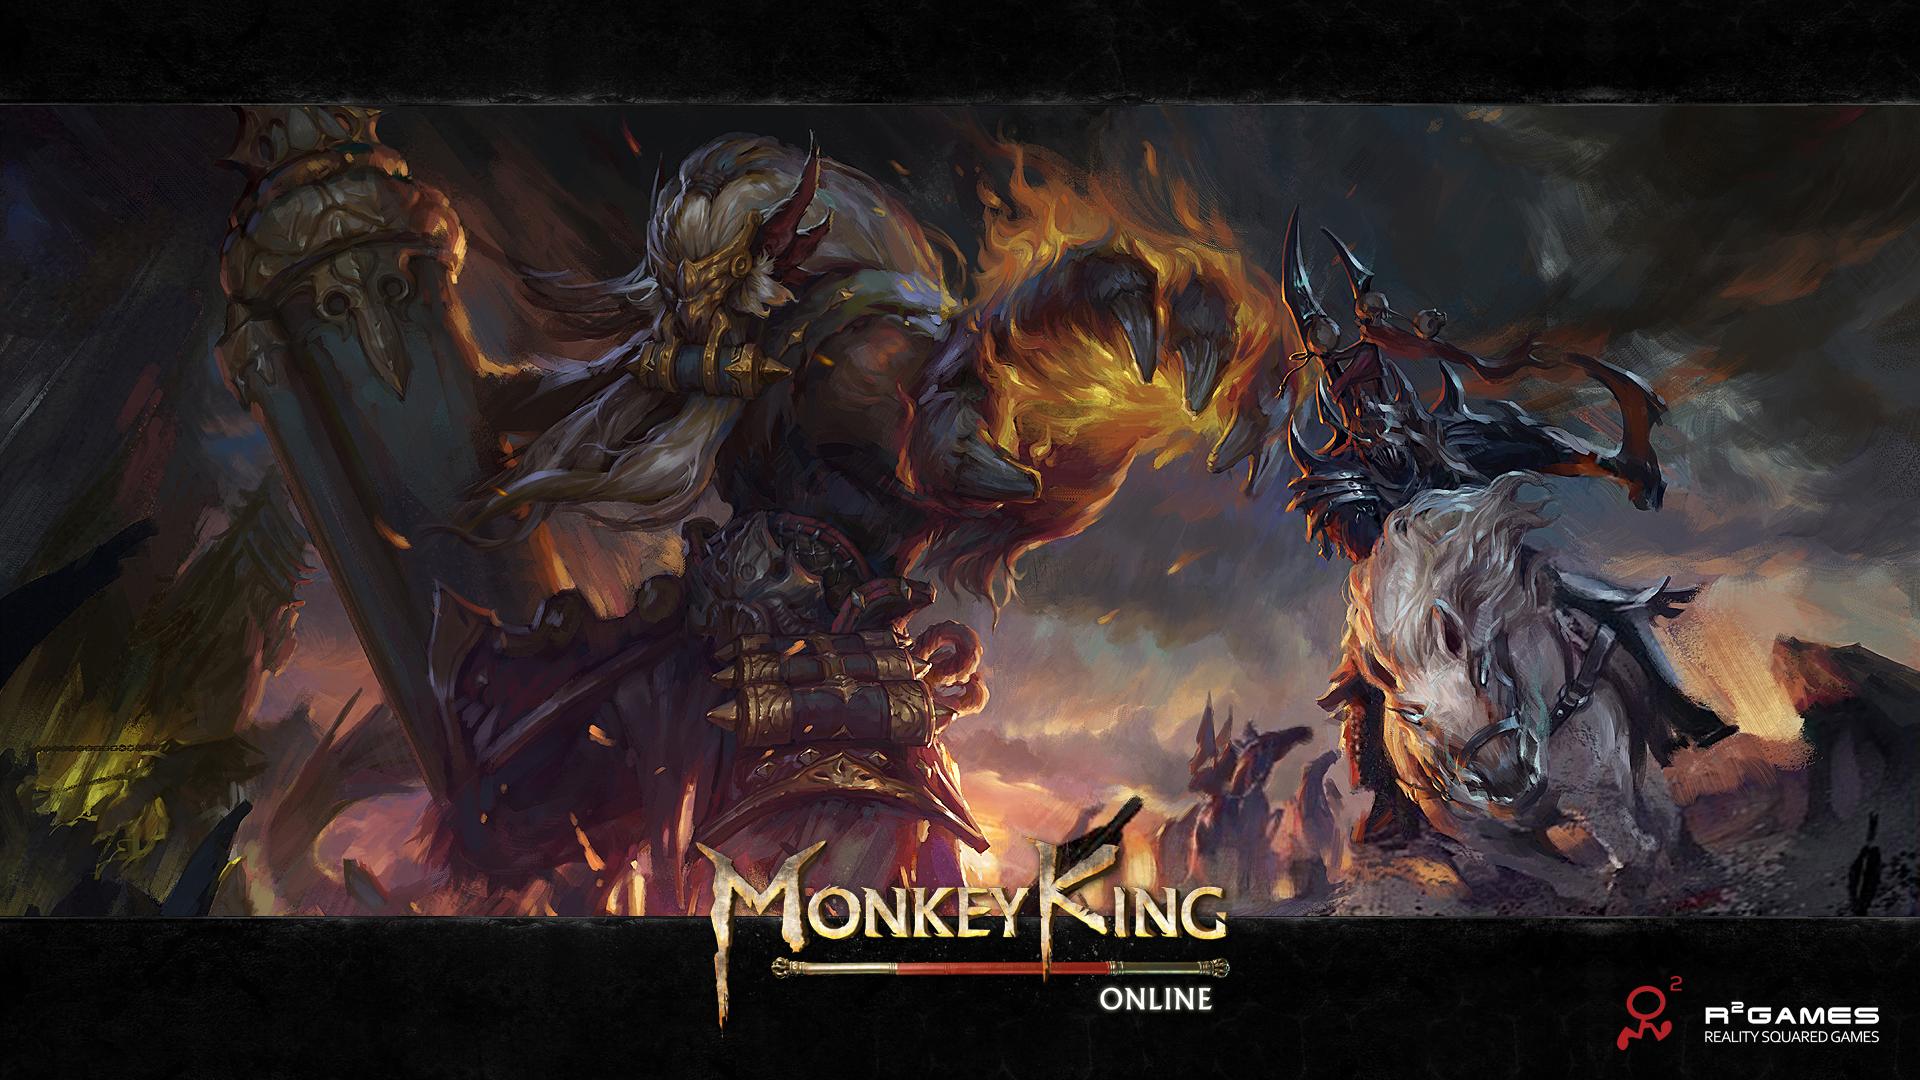 [monkey]_wallpaper1.jpg